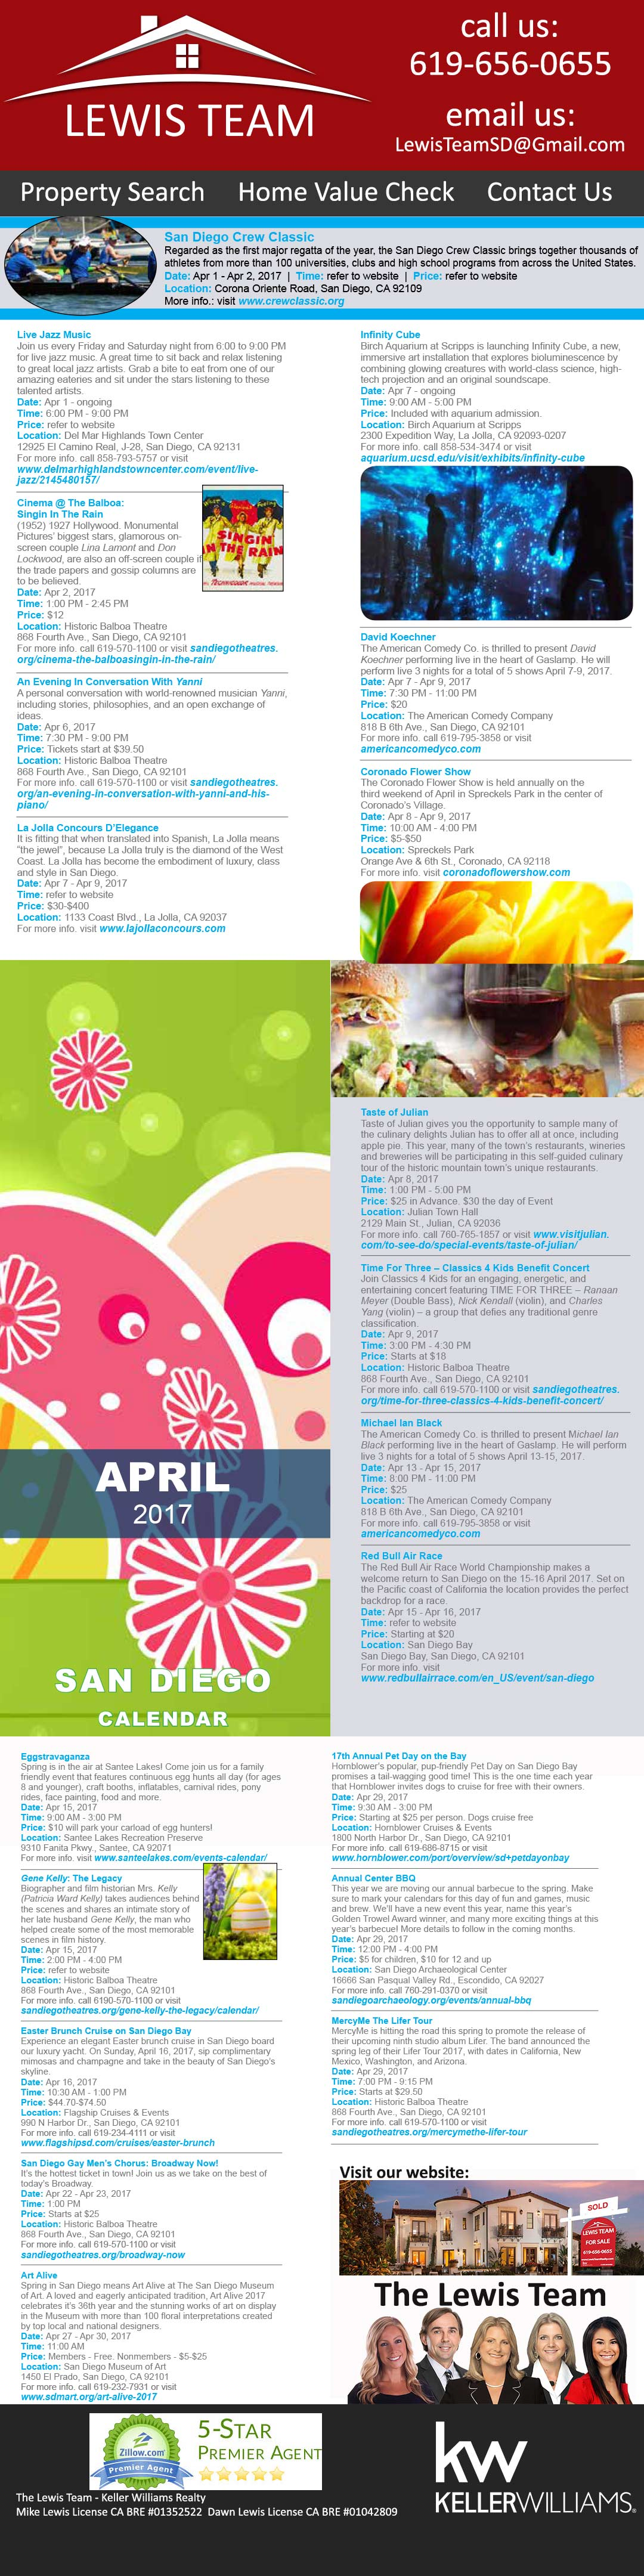 The-Lewis-Team-Calendar of Events April 2017